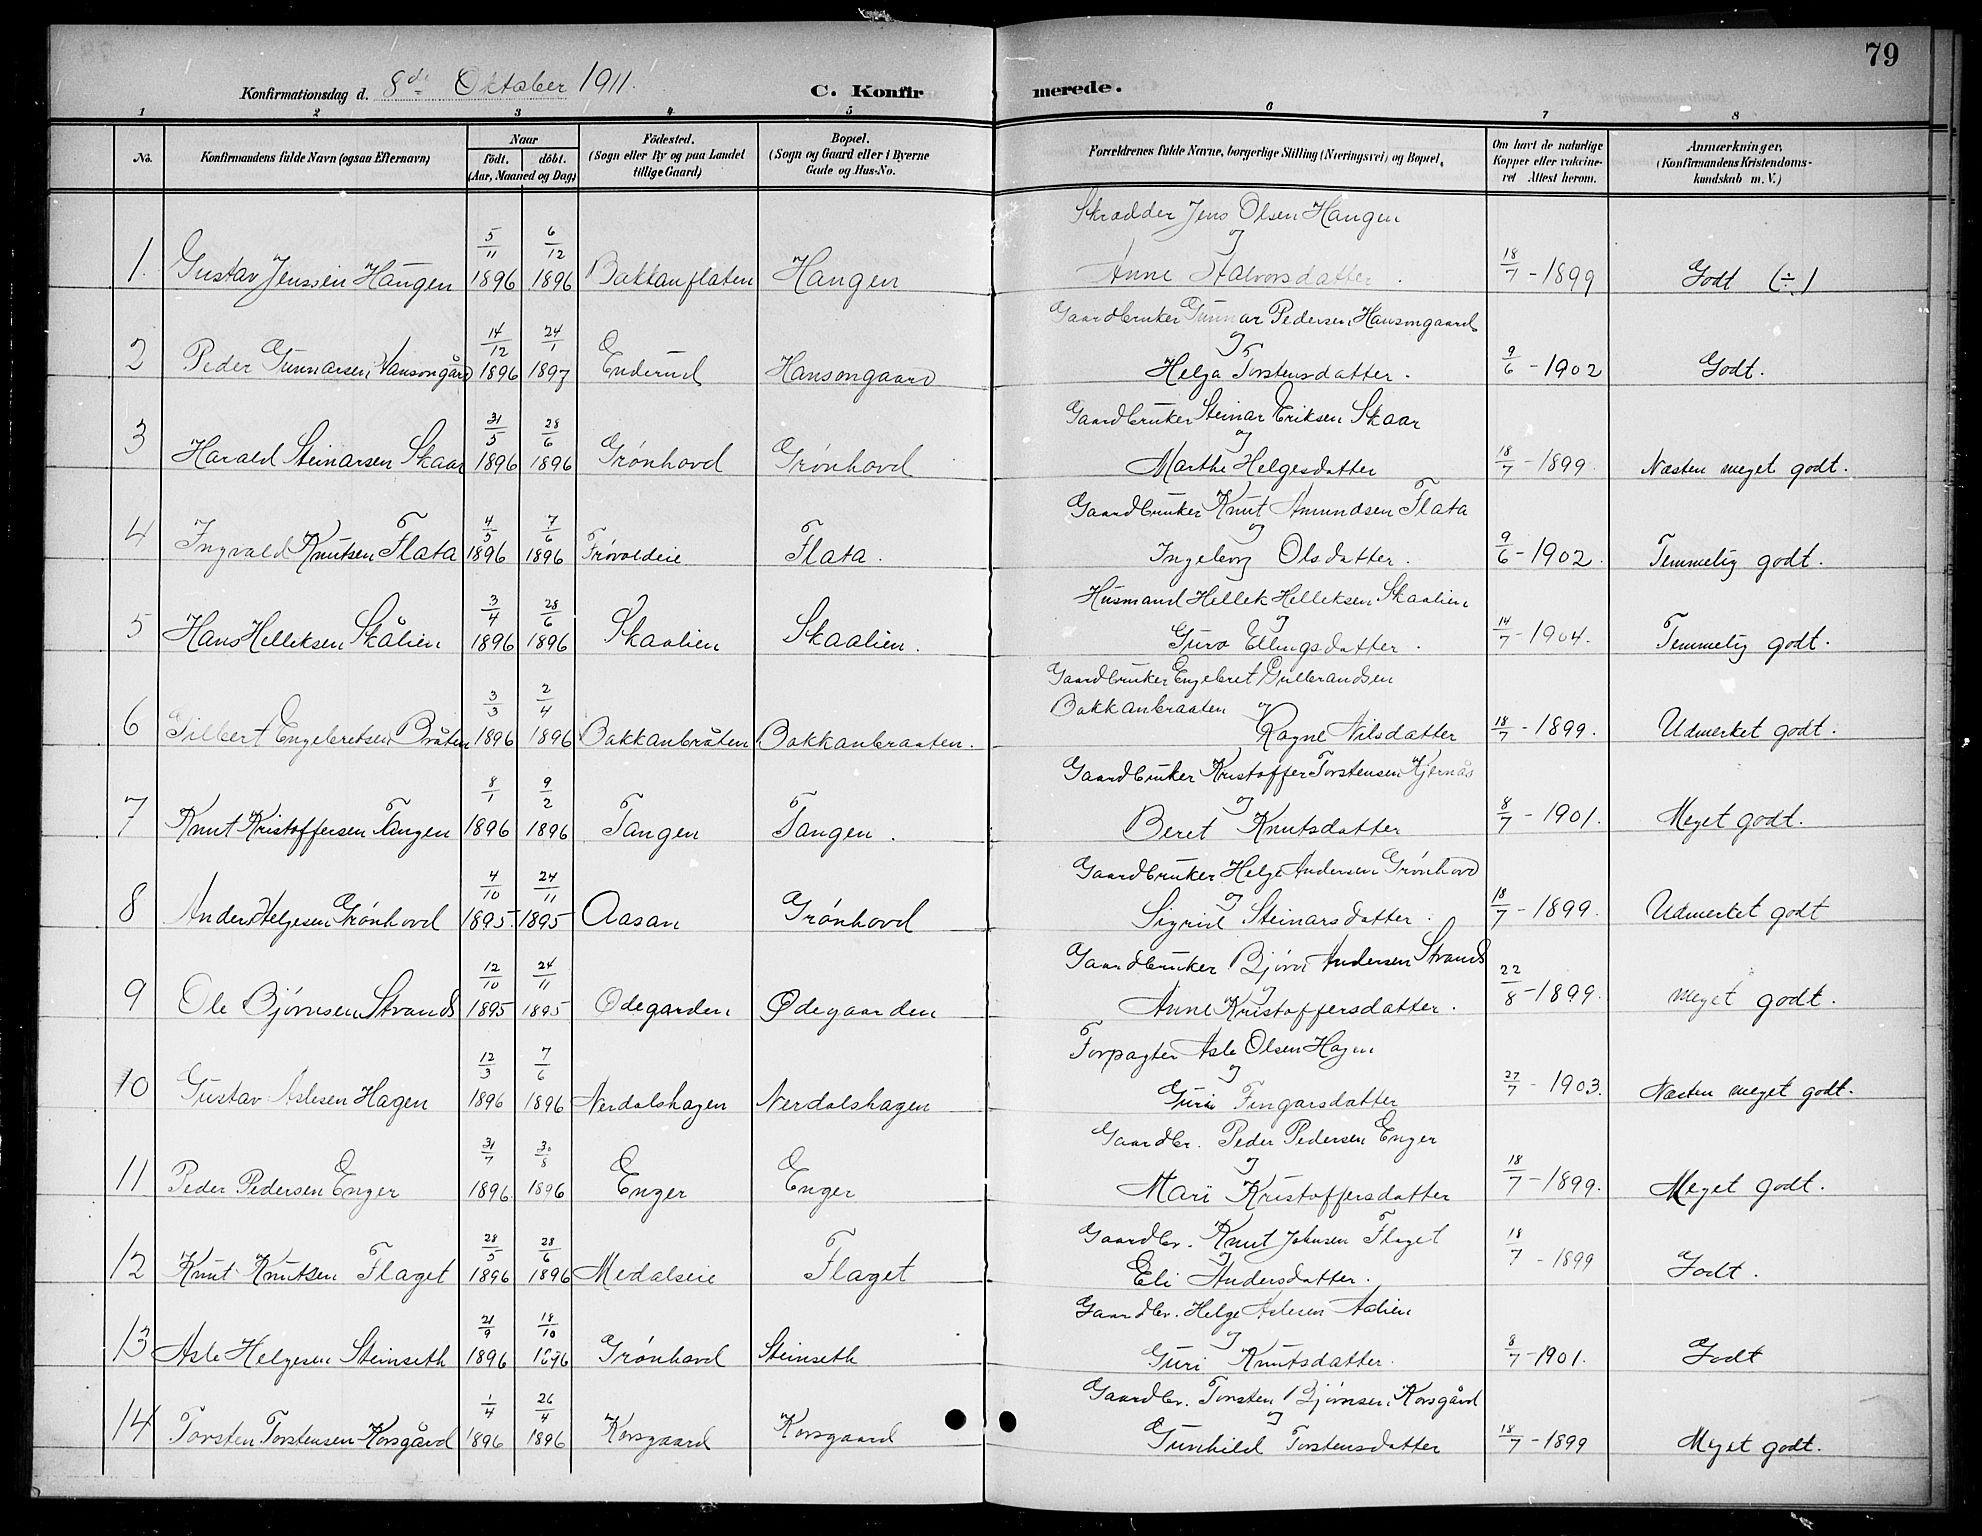 SAKO, Sigdal kirkebøker, G/Gb/L0003: Klokkerbok nr. II 3, 1901-1916, s. 79